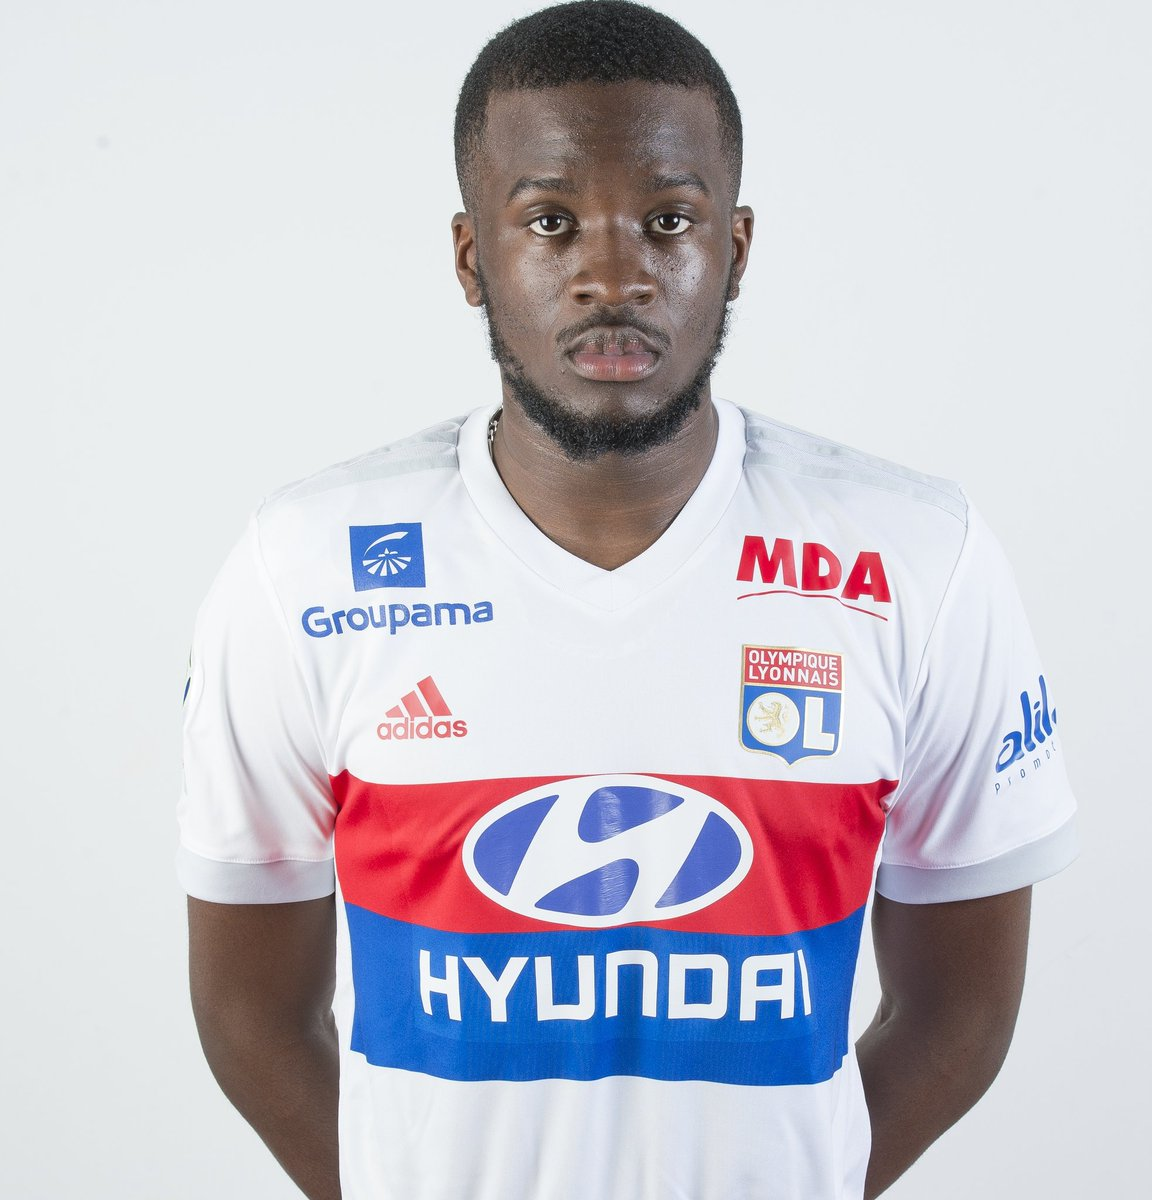 Maillot THIRD Olympique Lyonnais Tanguy NDOMBELE